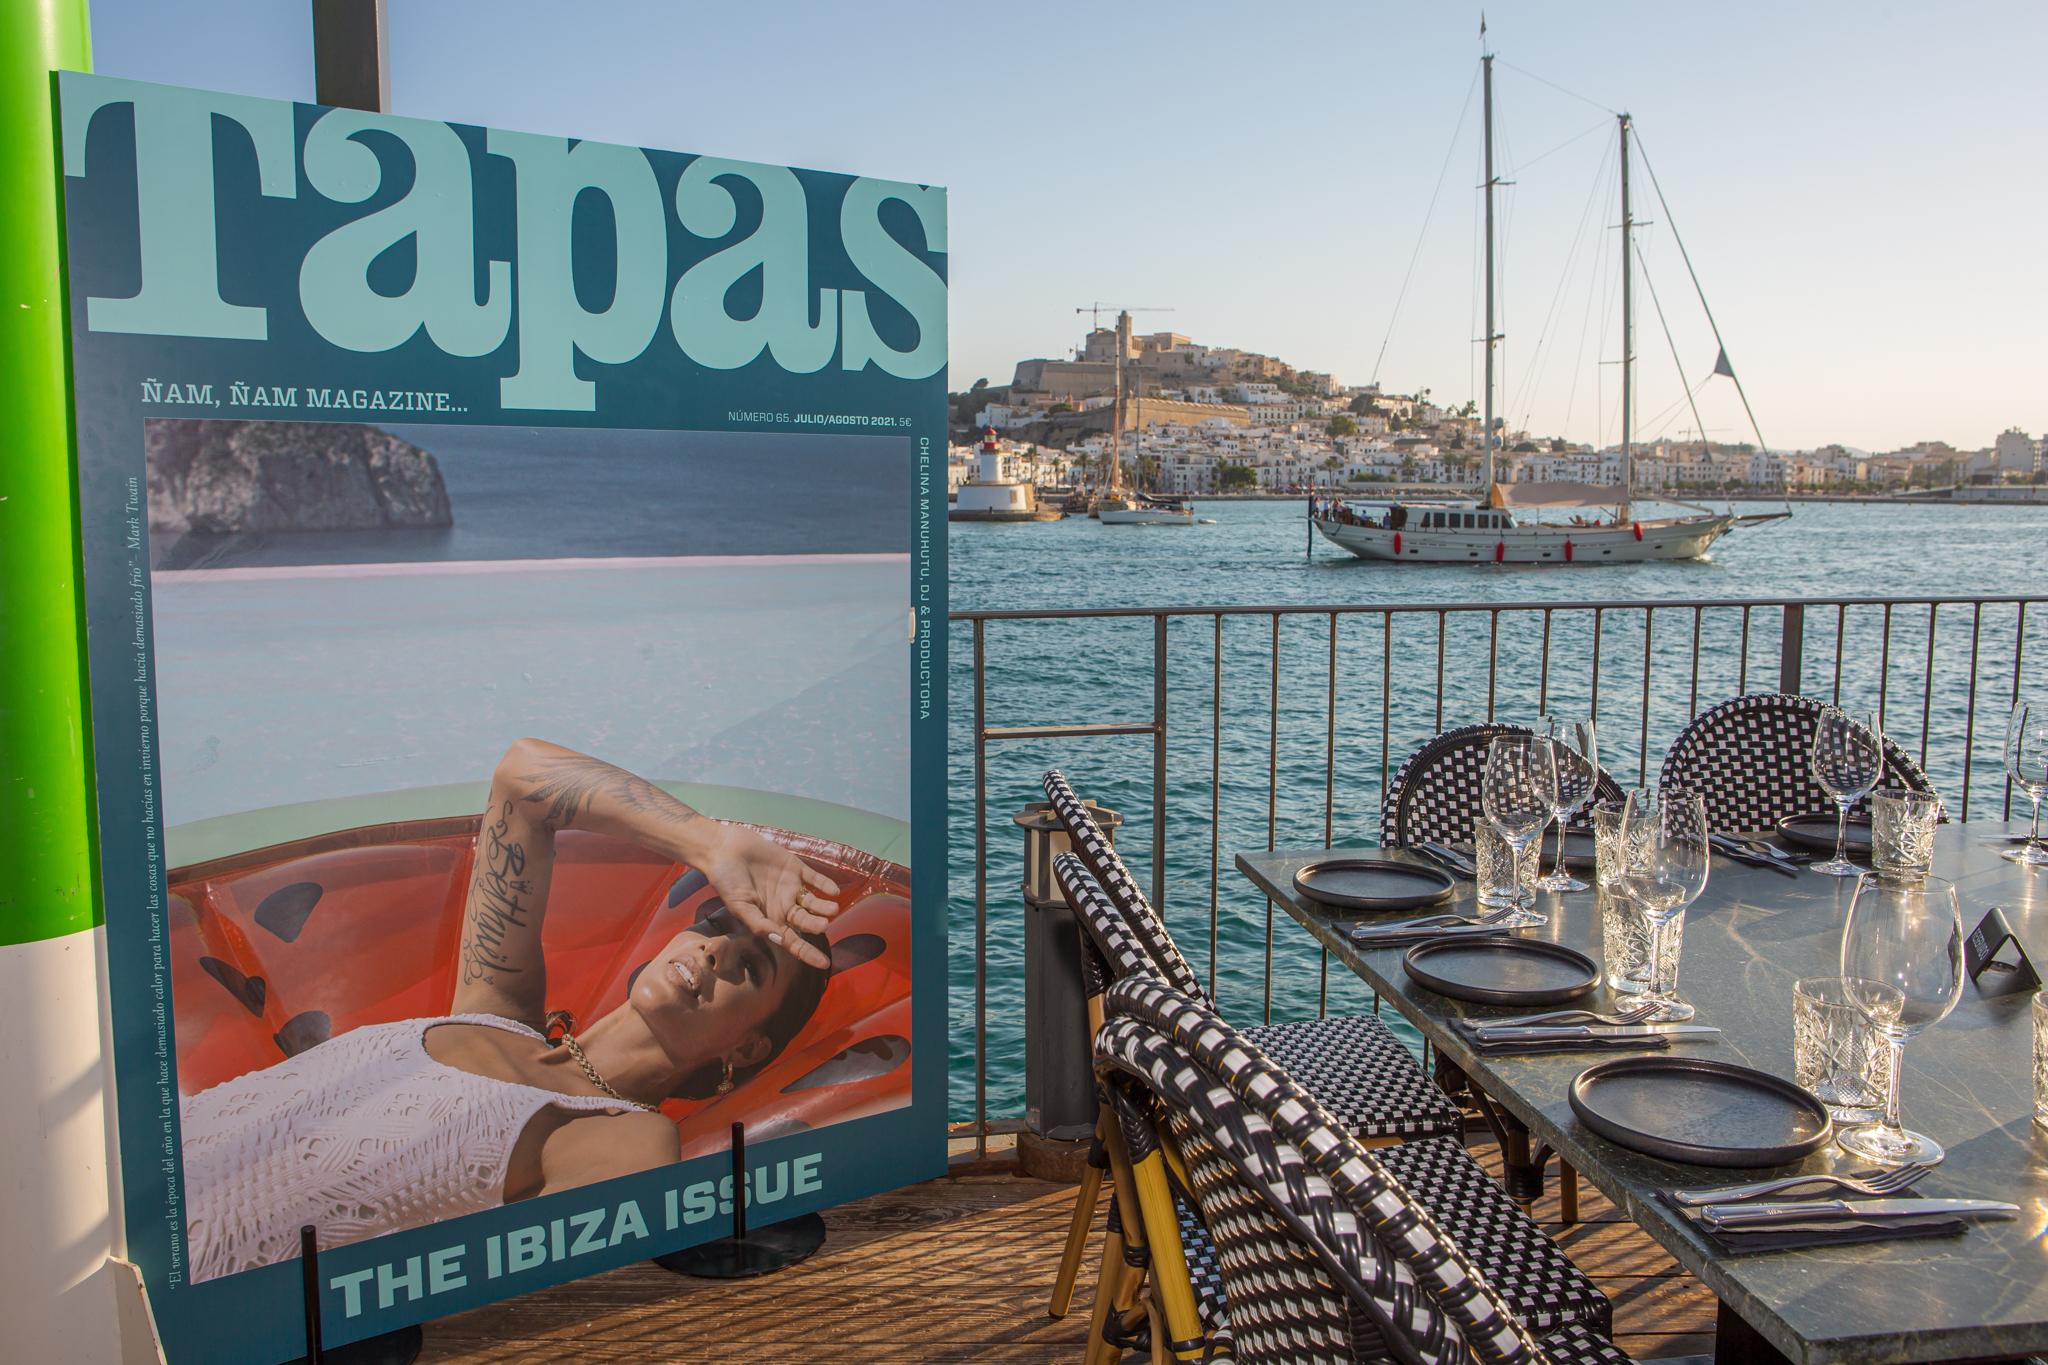 The Ibiza Issue